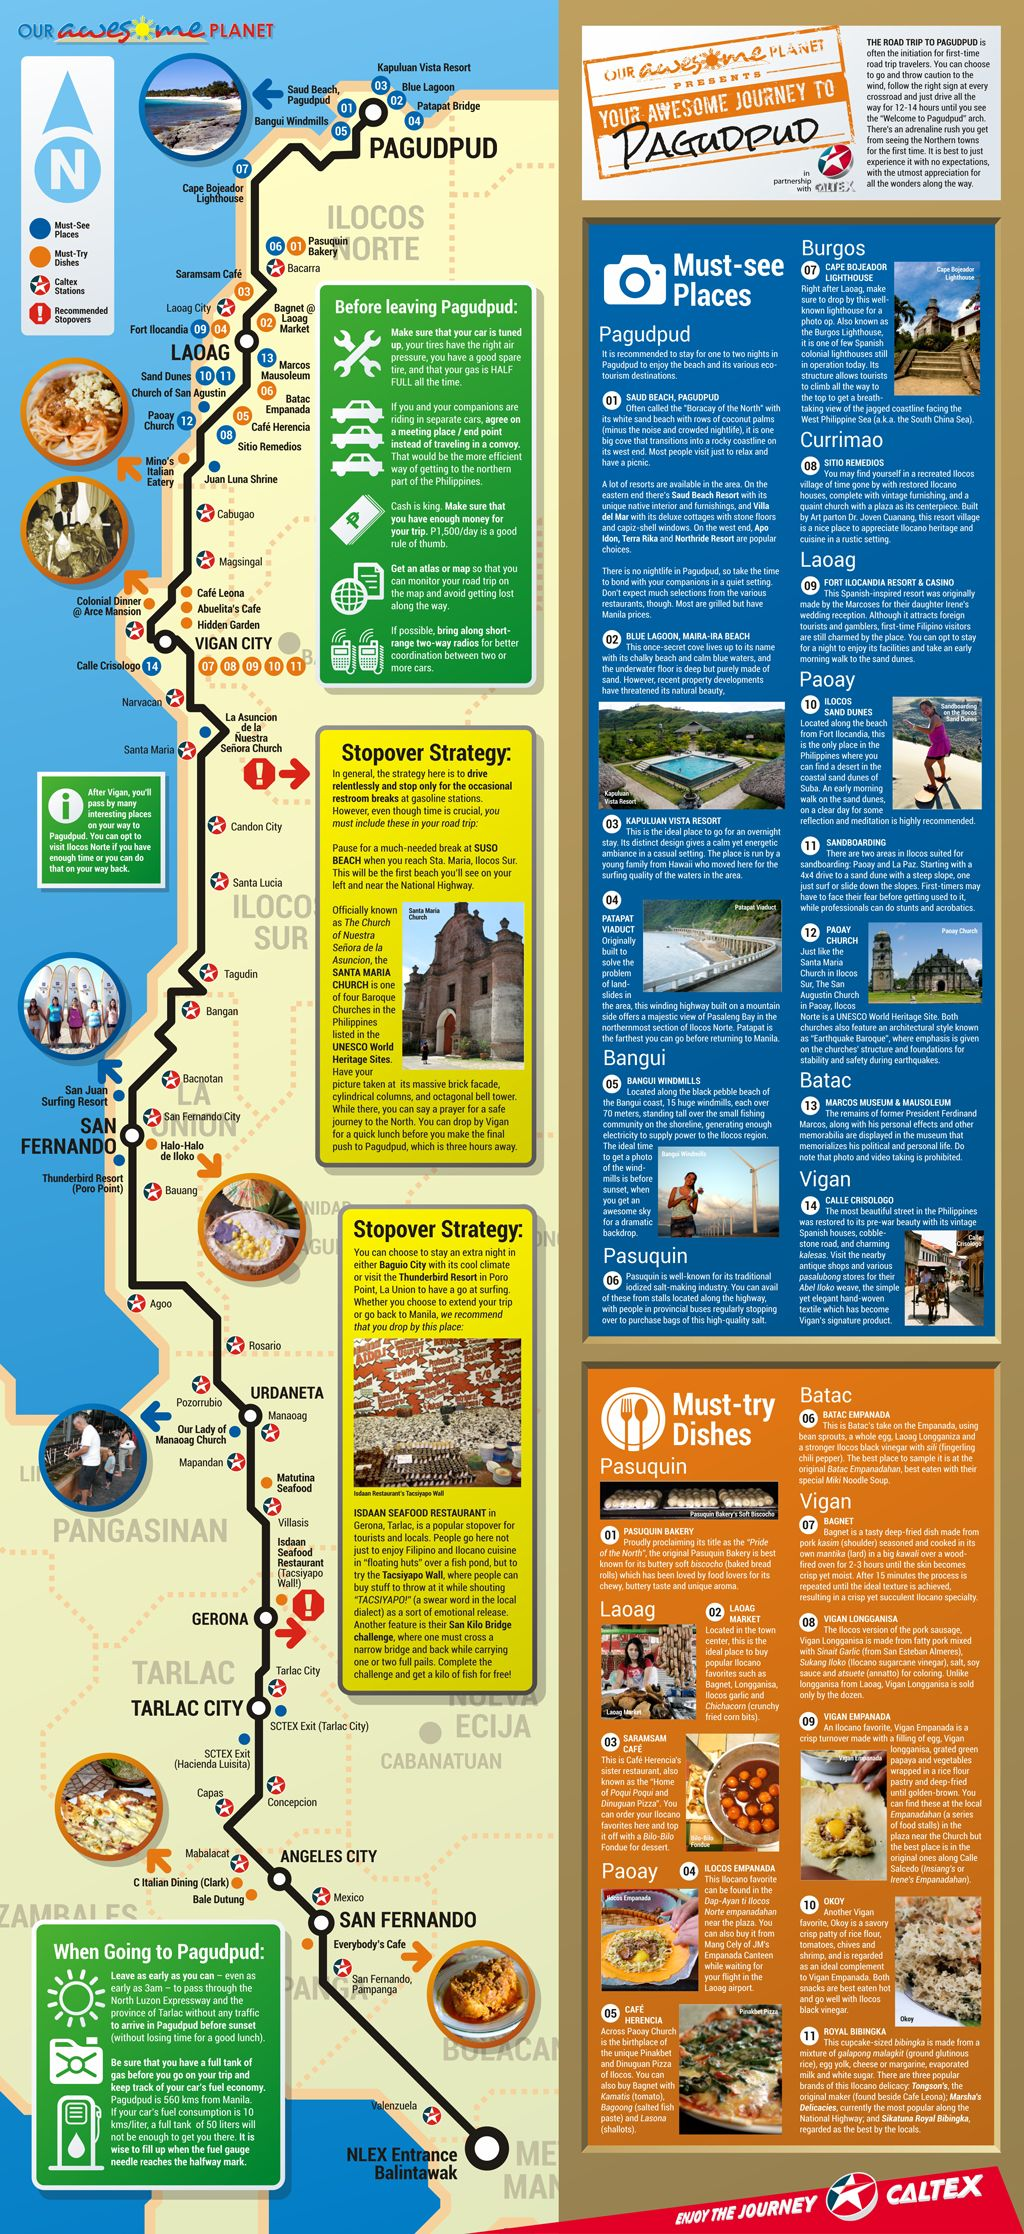 PAGUDPUD: Your Awesome Journey to Pagudpud (Infographic ...